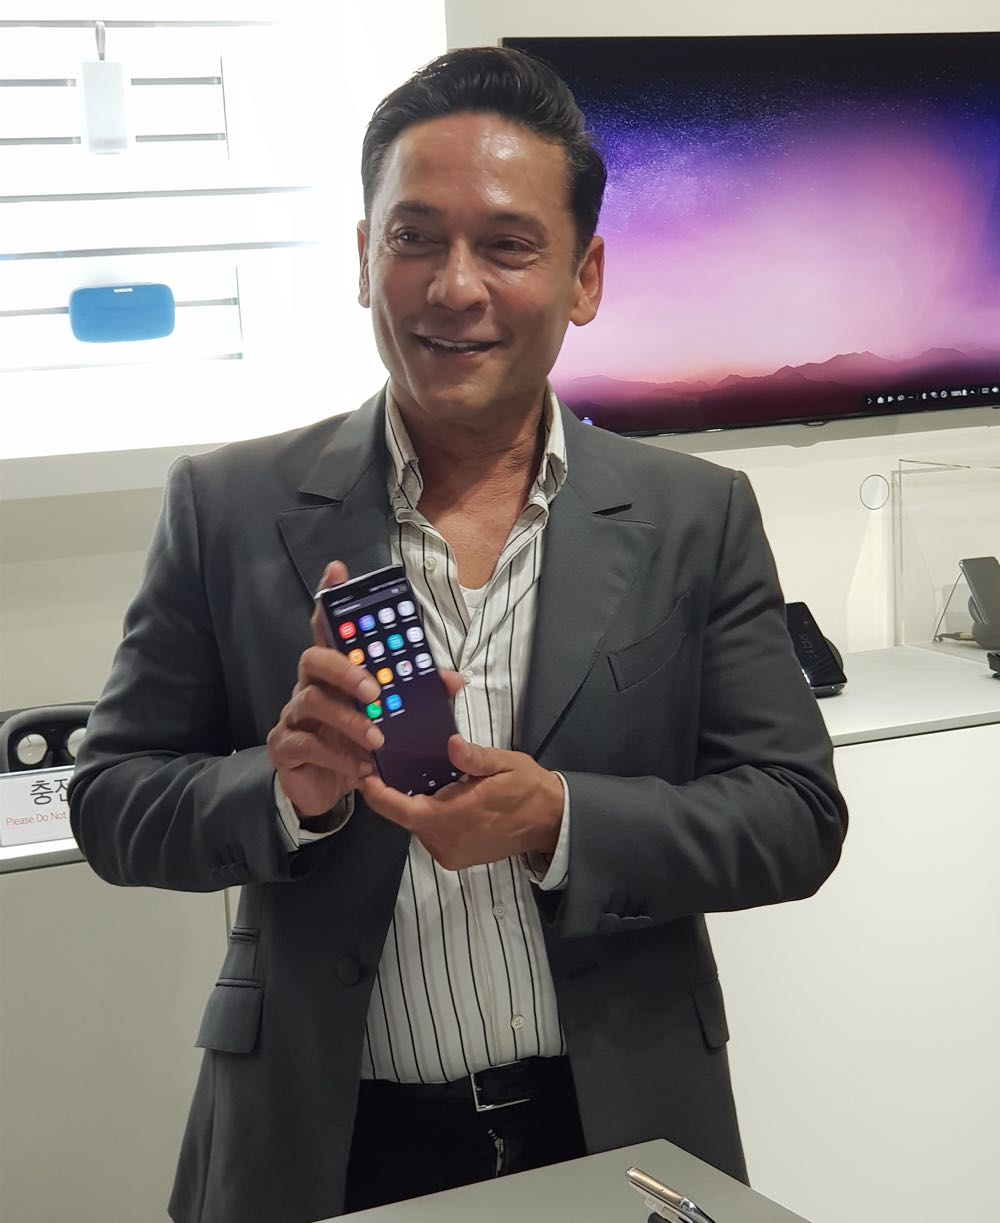 Pio Schunker - head of global marketing for Samsung Mobile